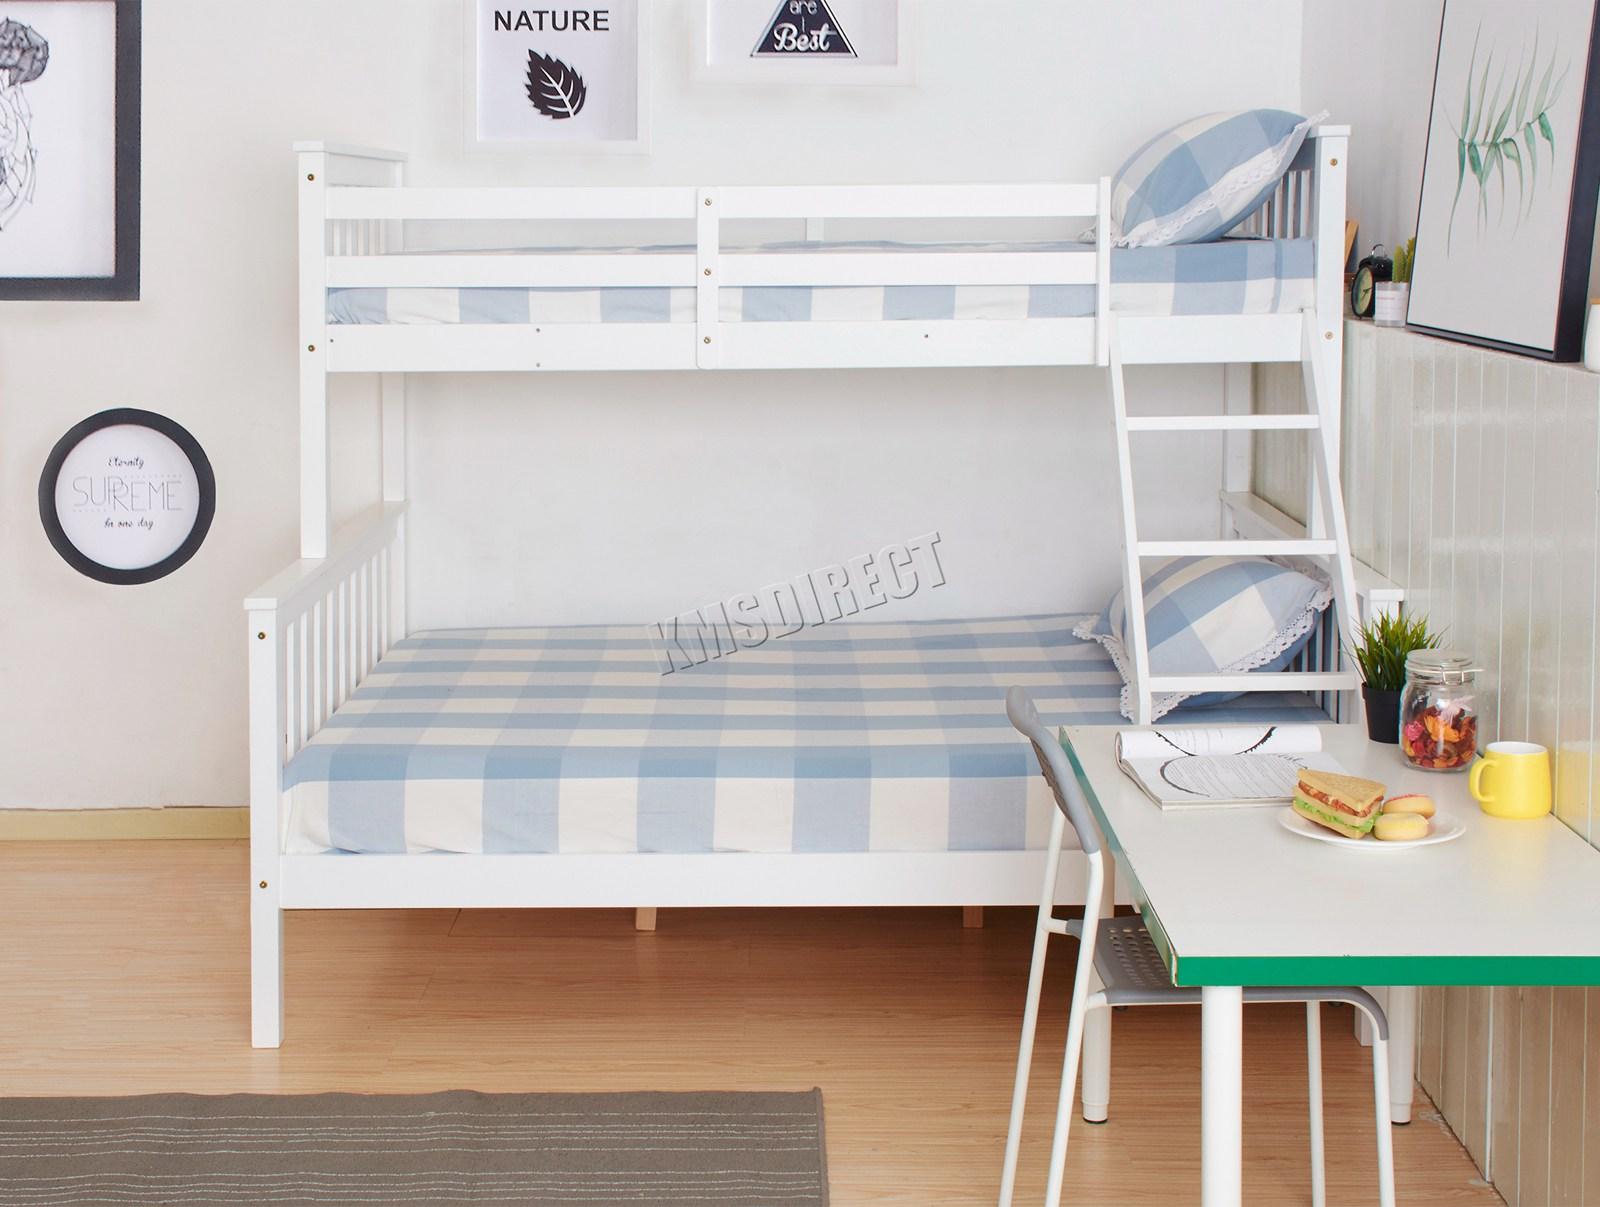 Westwood New Detachable Bunk Beds Wood Frame Children S Bed No Mattress 5055418322584 Ebay